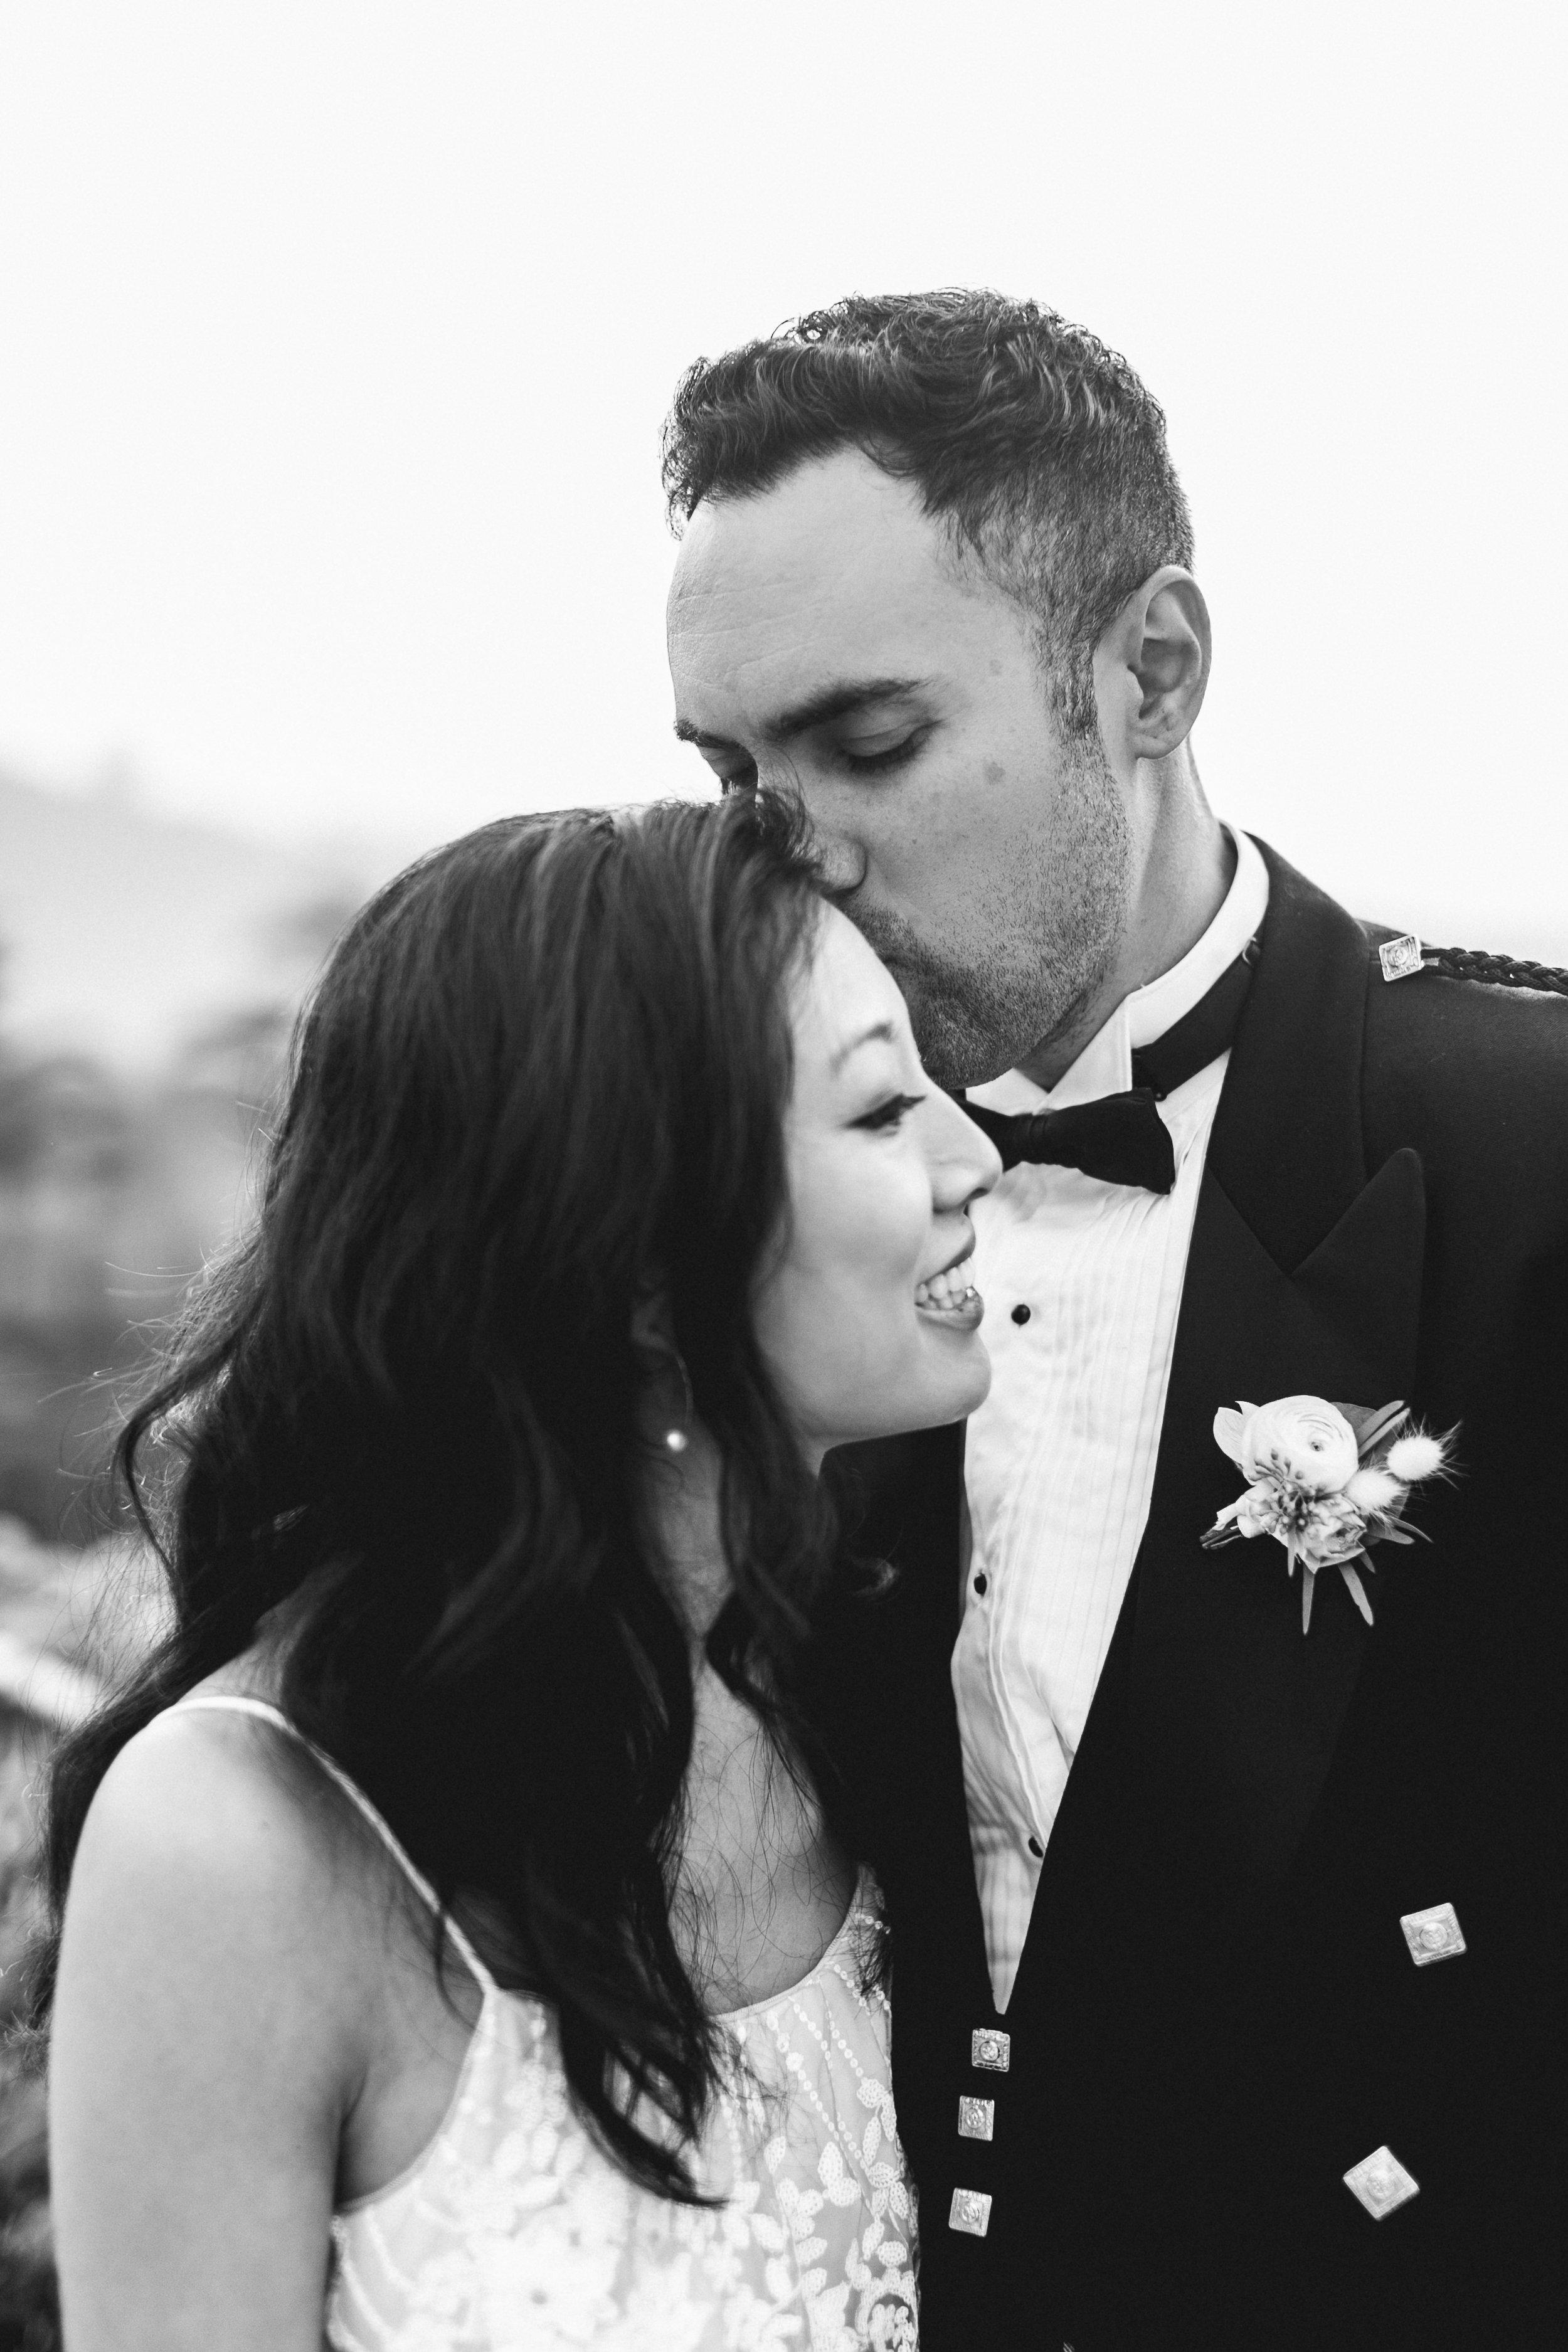 Intimate Vineyard Wedding in Carmel-by-the-sea, California